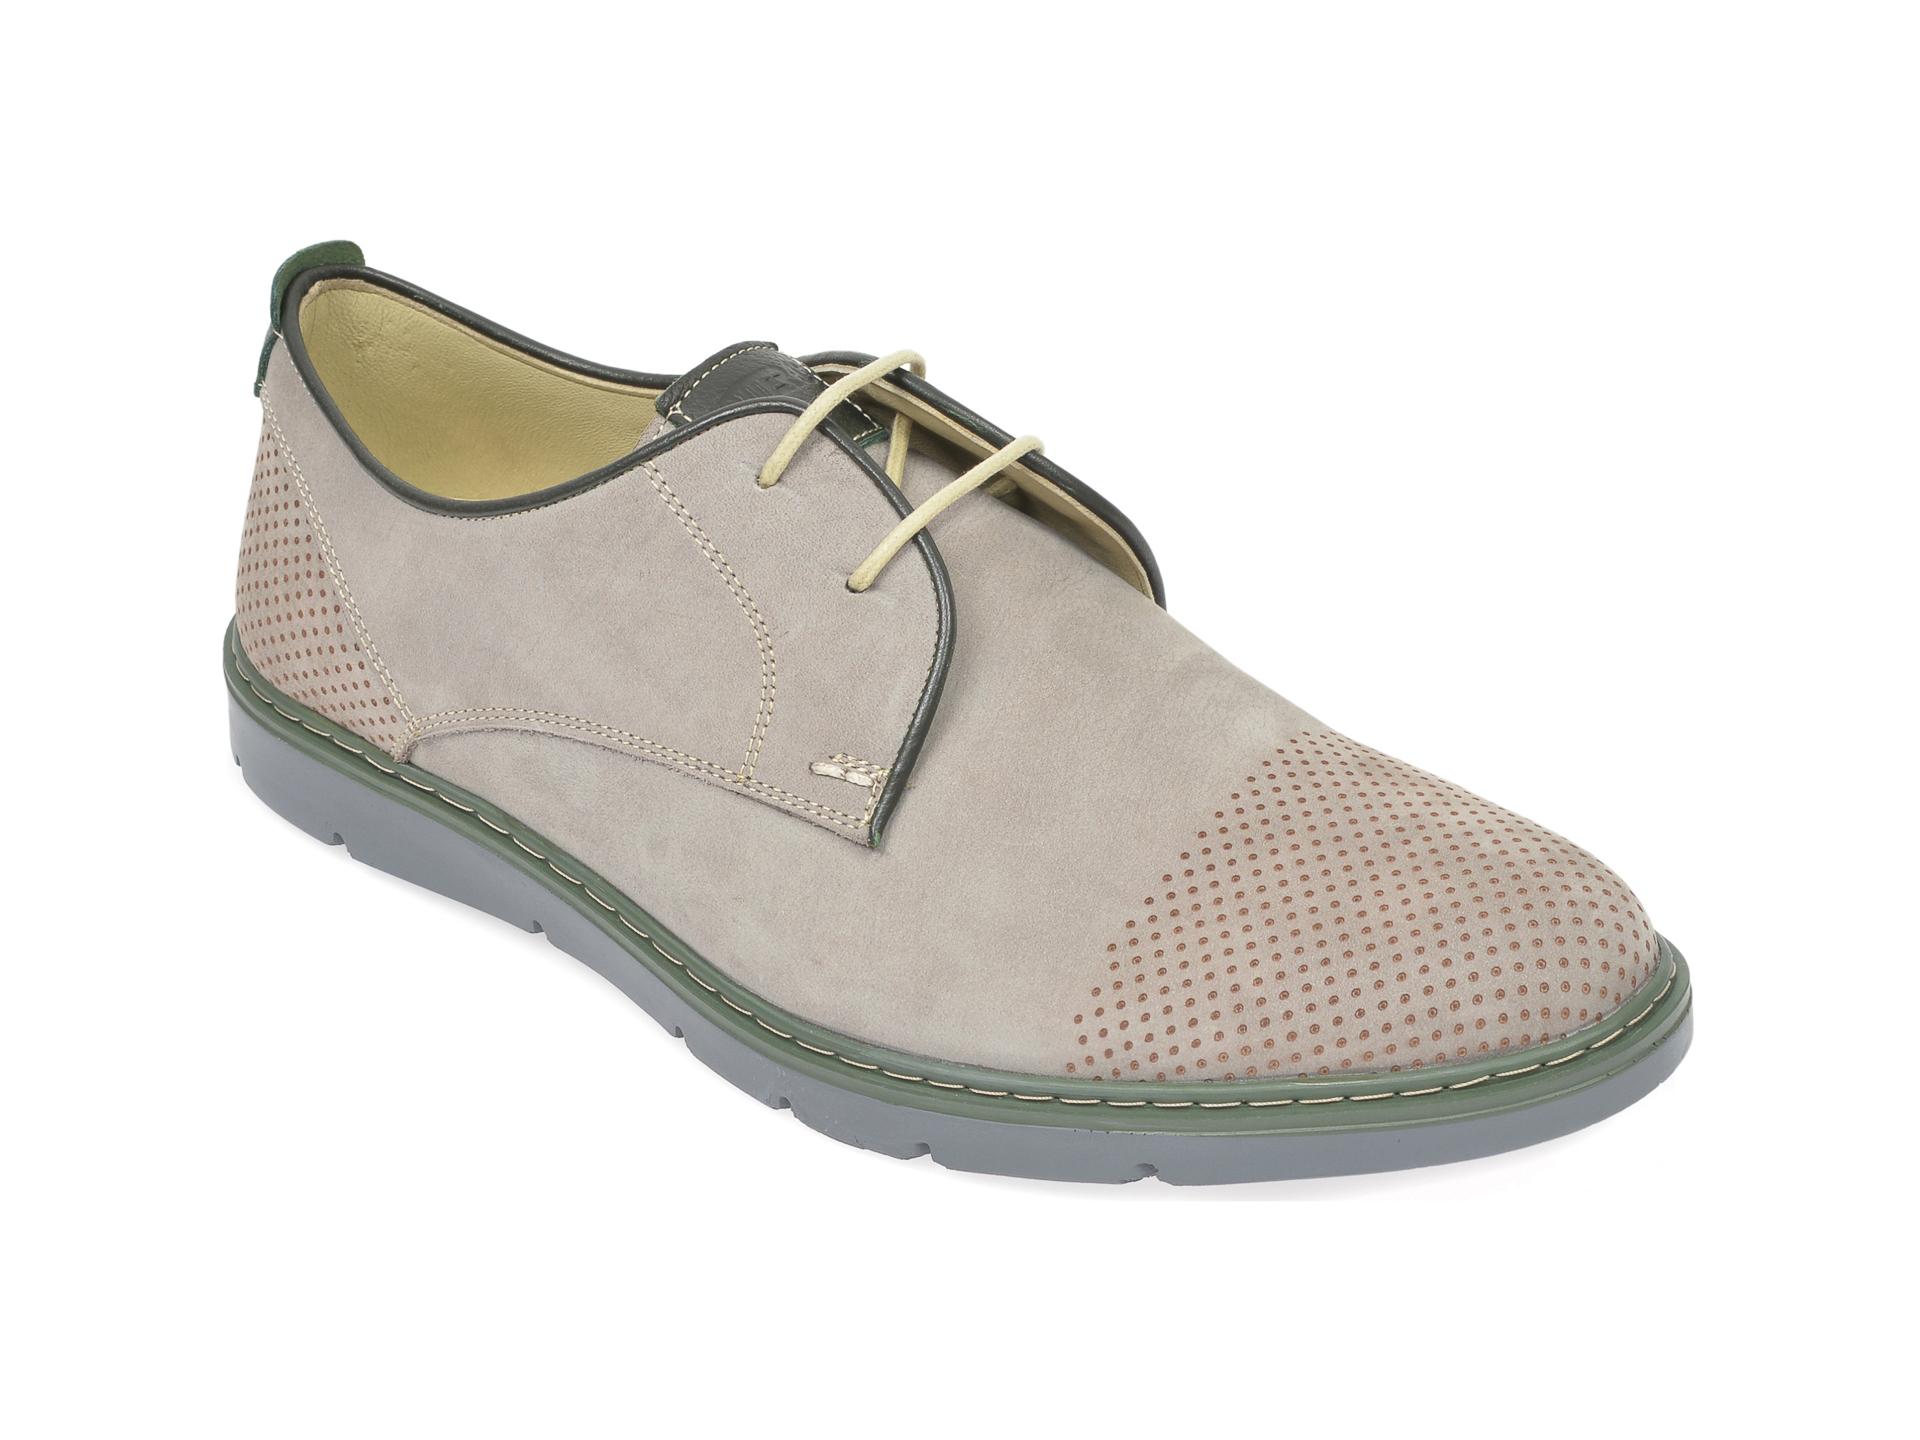 Pantofi OTTER gri, 59251, din nabuc imagine